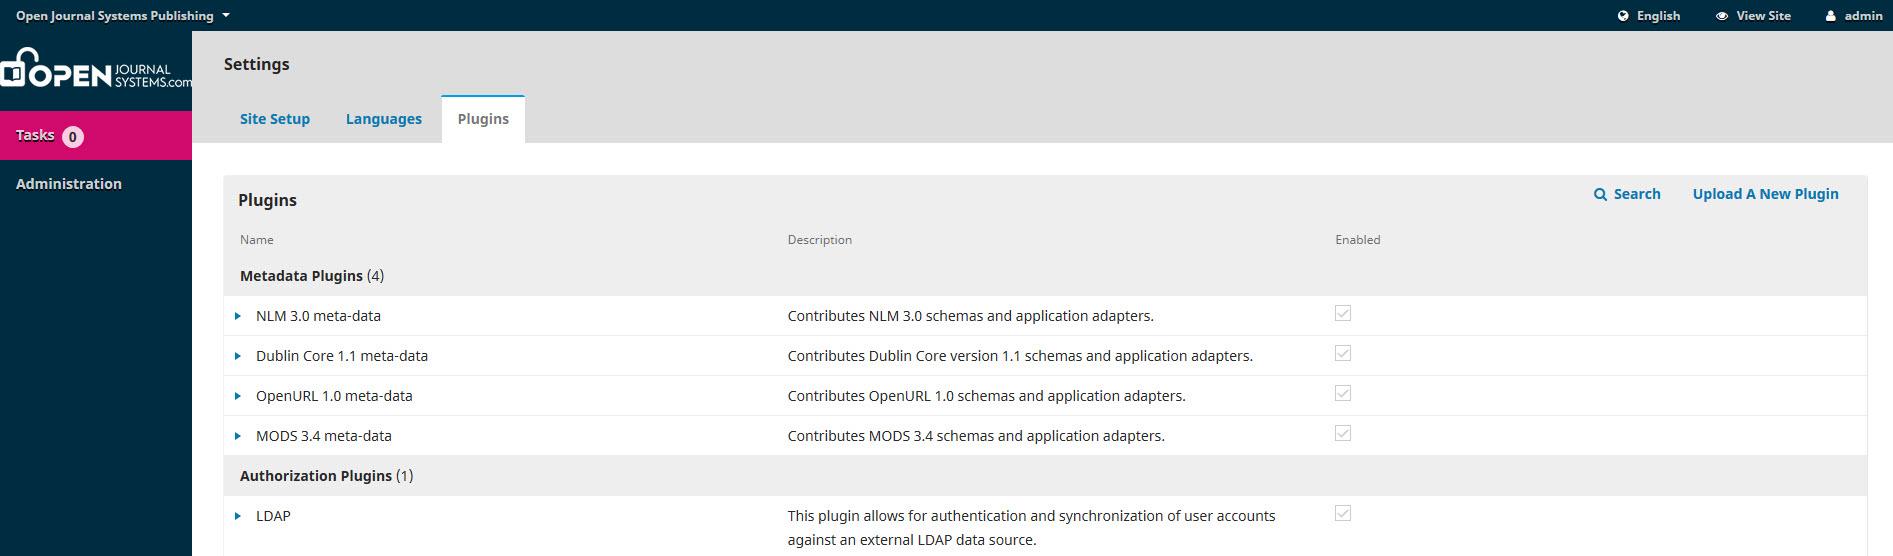 ojs3-site-settings-plugins